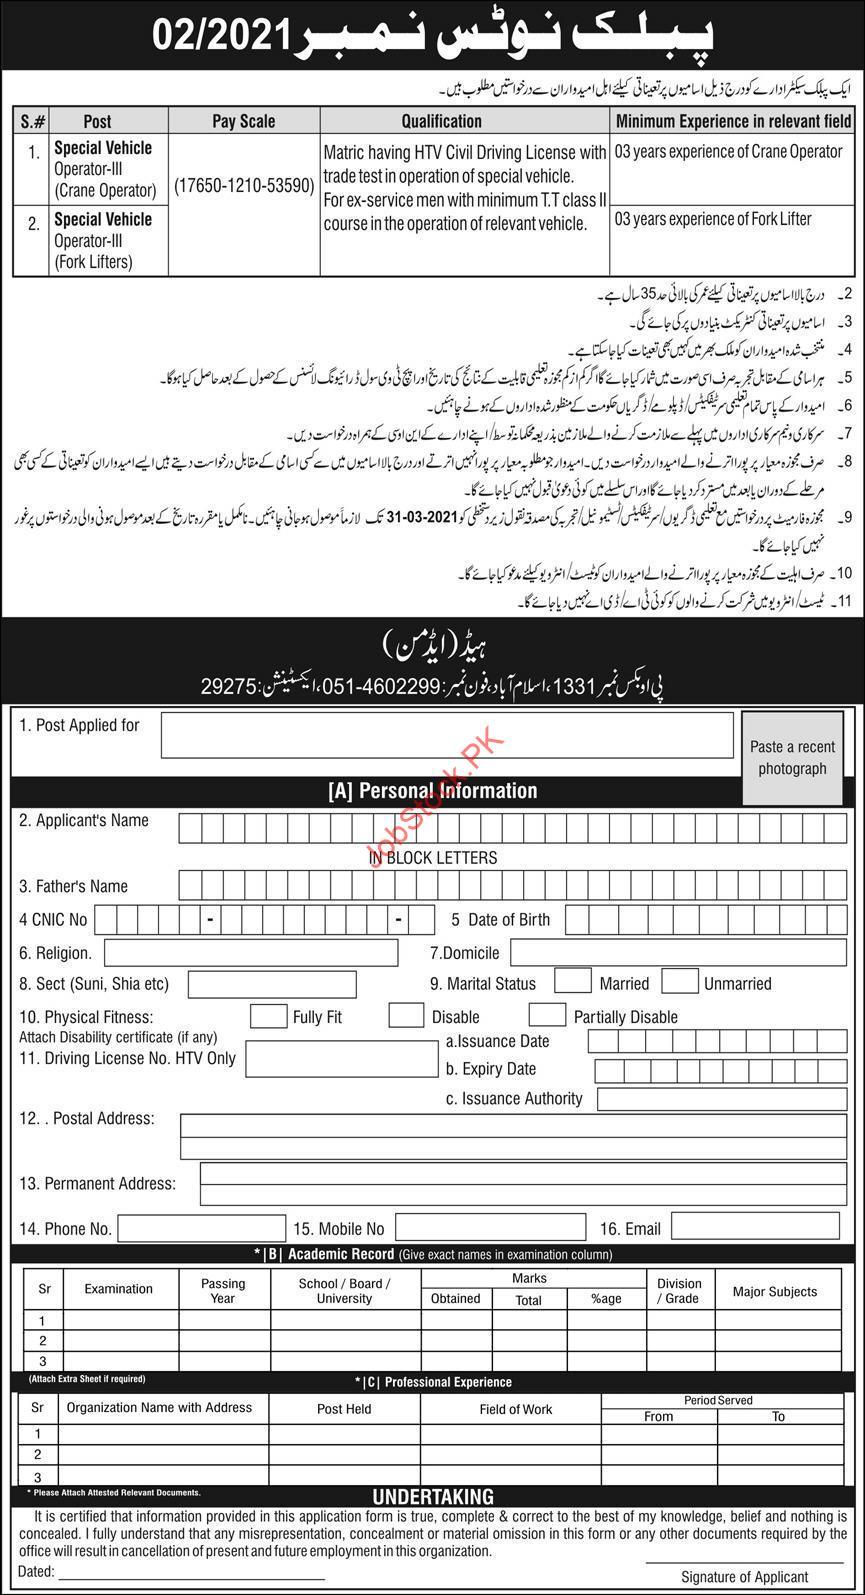 Driver Jobs In Public Sector Organization 2021 P.o Box No.1331 Islamabad